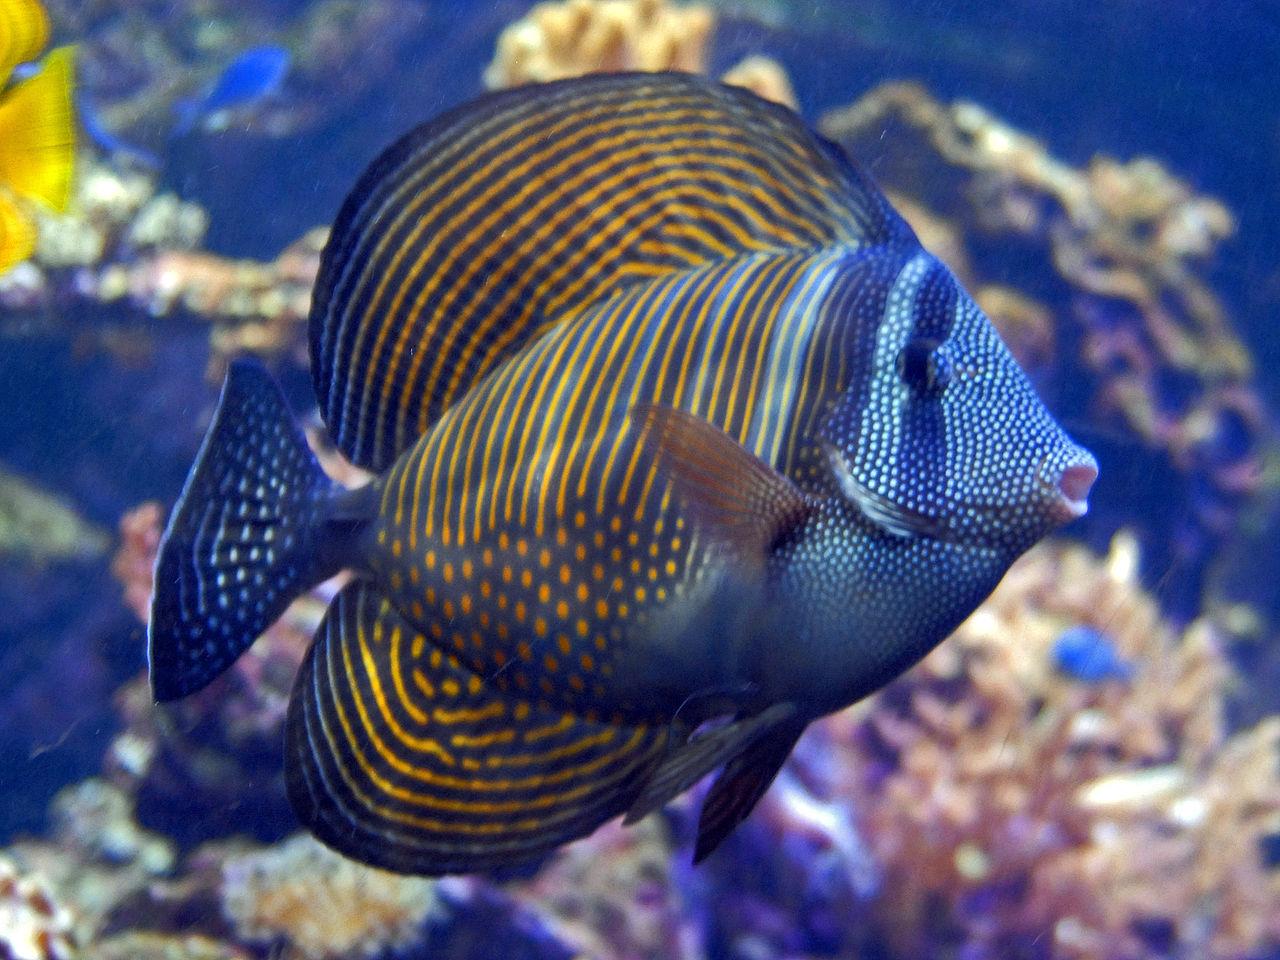 Aquarium de 840 litres recifal, les différentes étapes d'installation 1280px-Acanthuridae_-_Zebrasoma_desjardinii